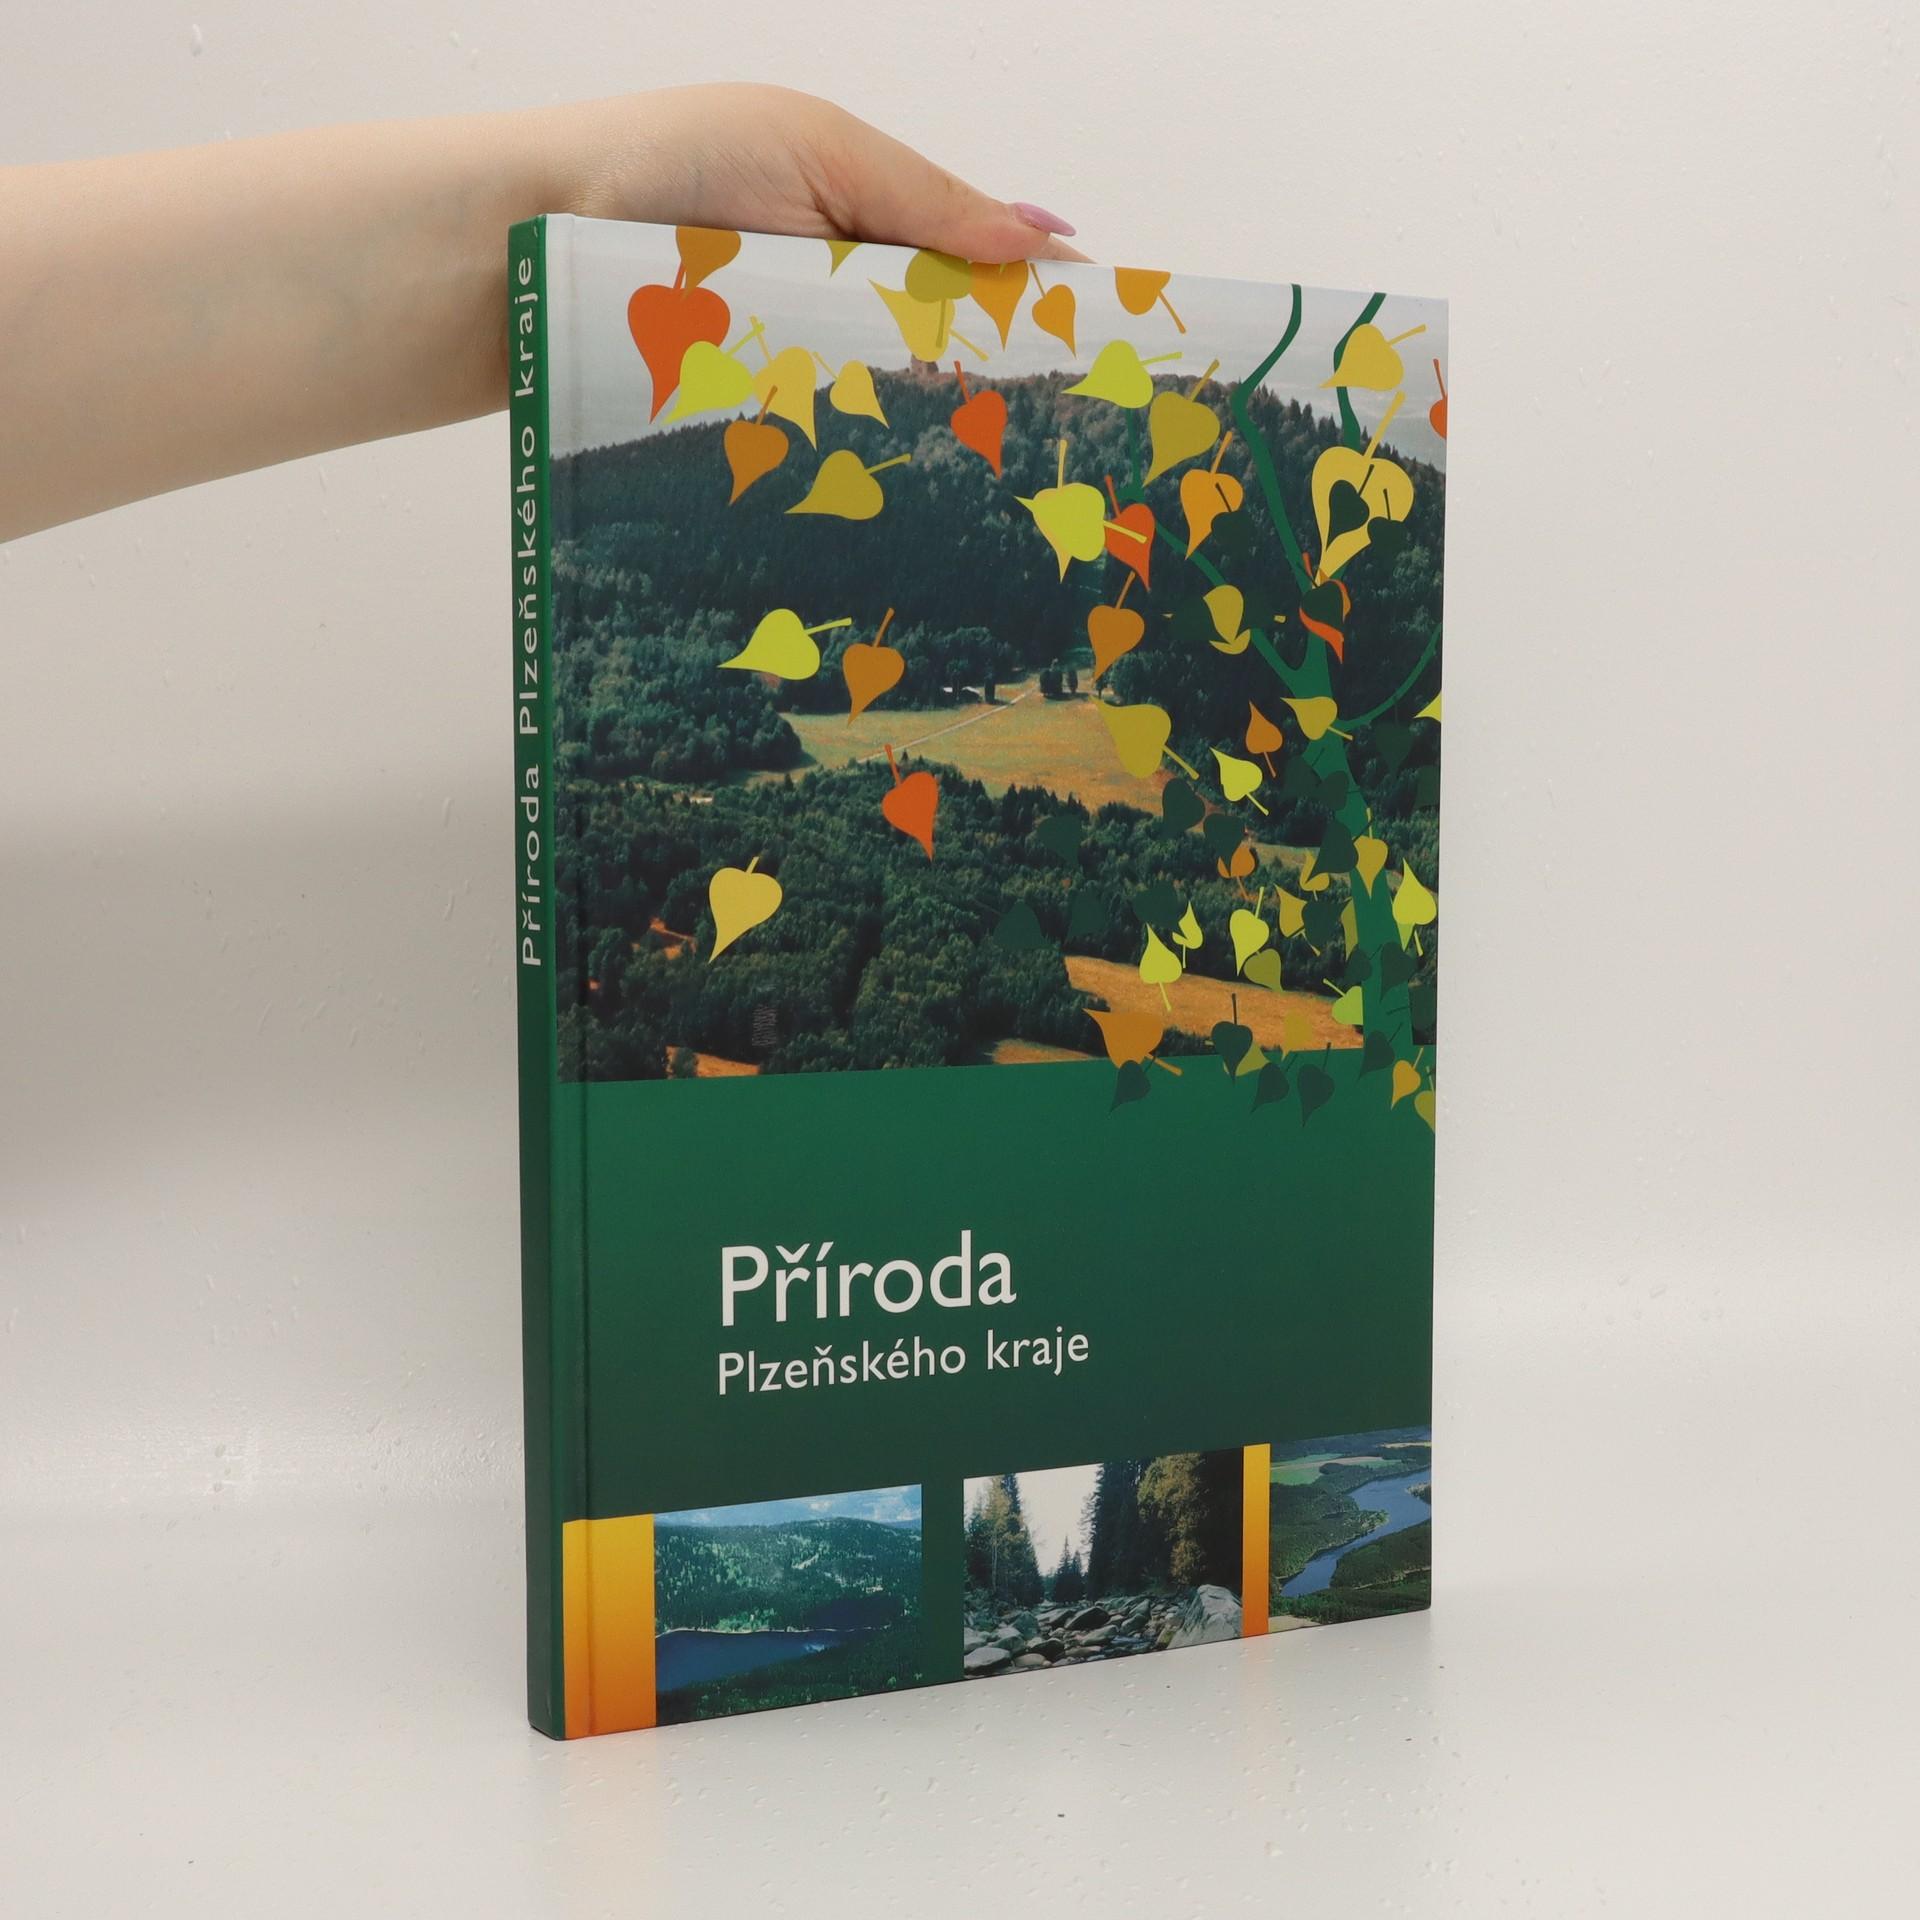 antikvární kniha Příroda Plzeňského kraje, neuveden